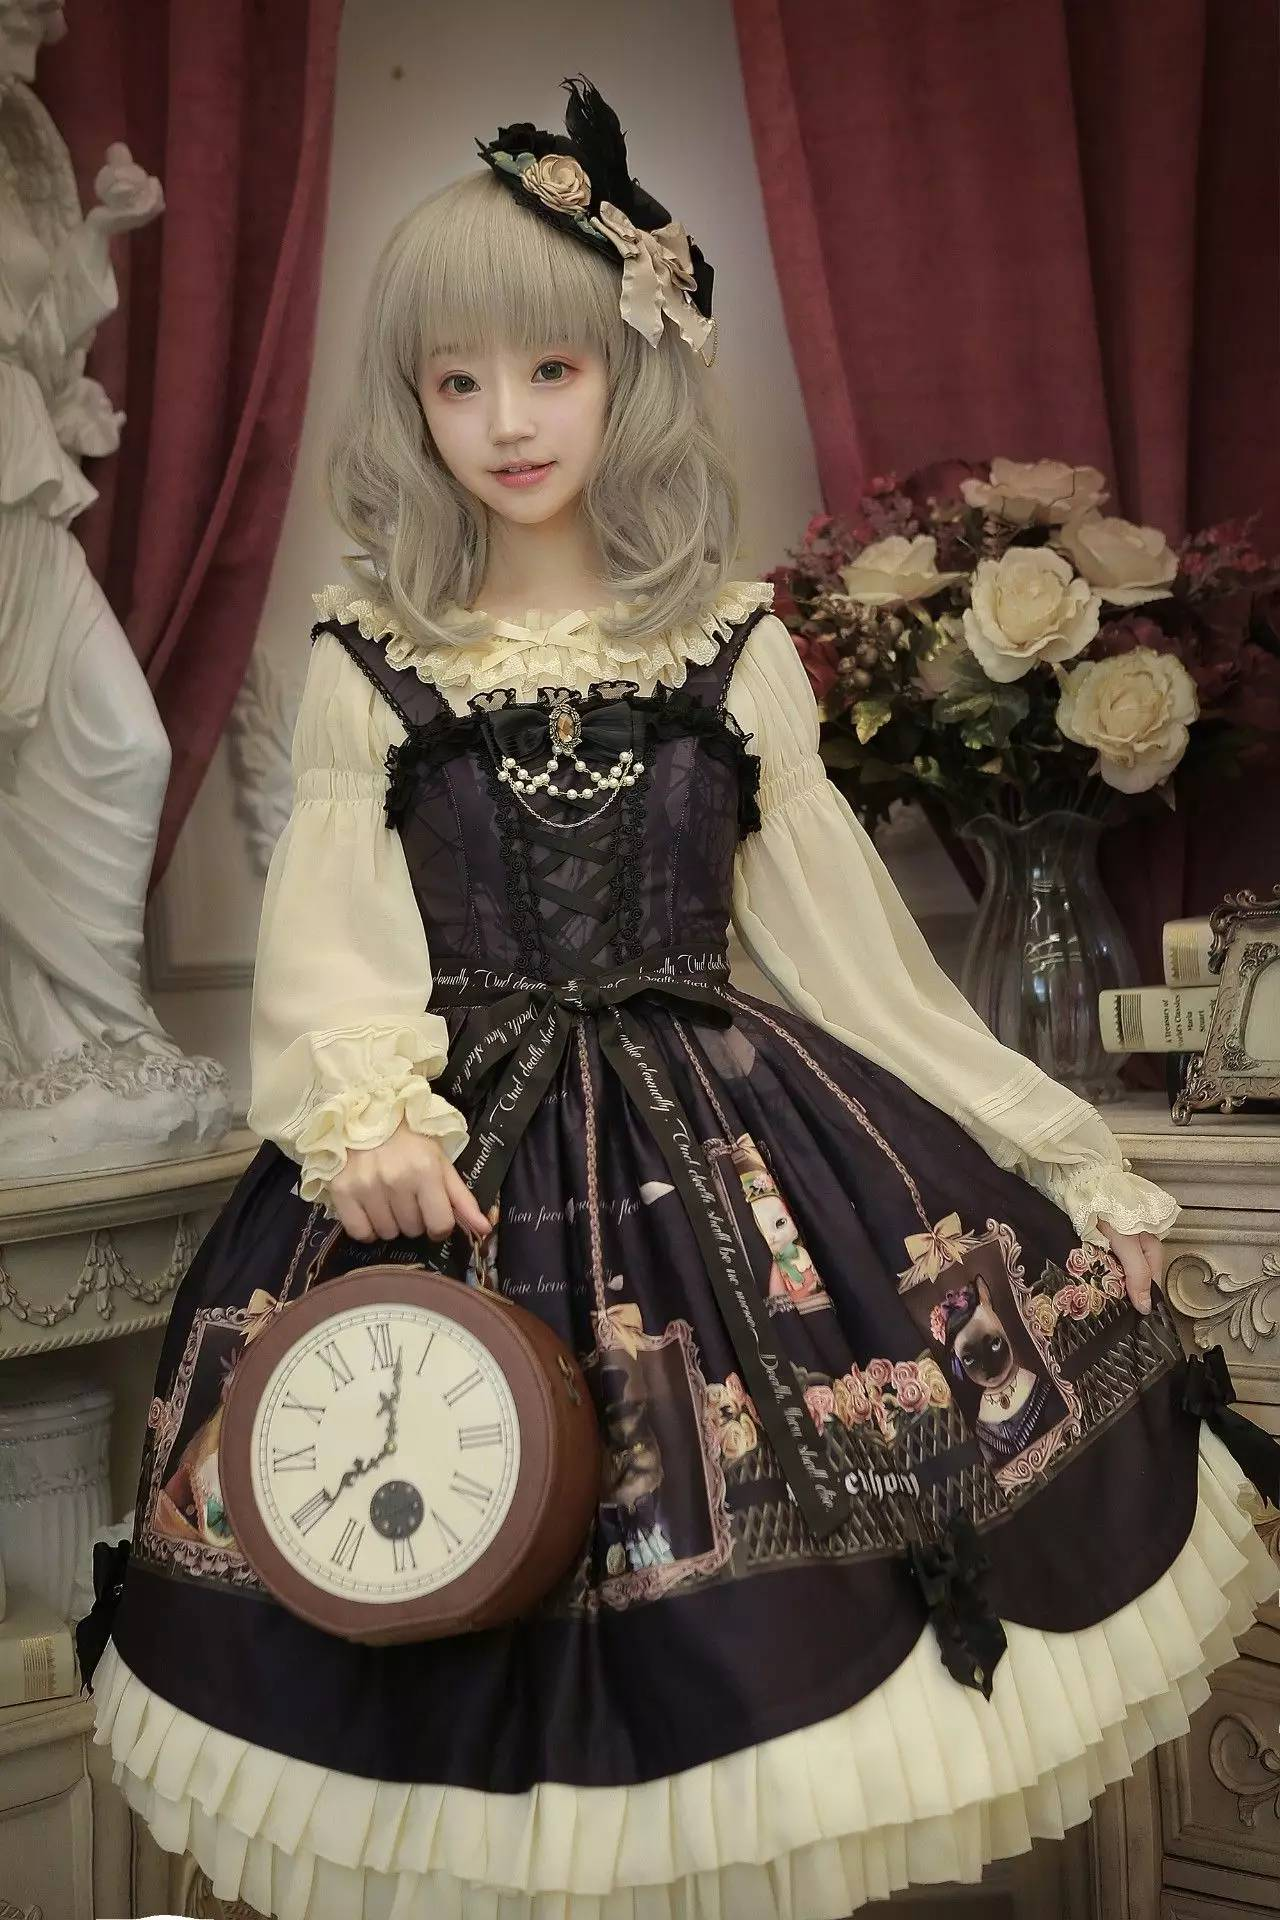 lolita的实体店_1号店有实体店吗_lolita实体店有没有山的